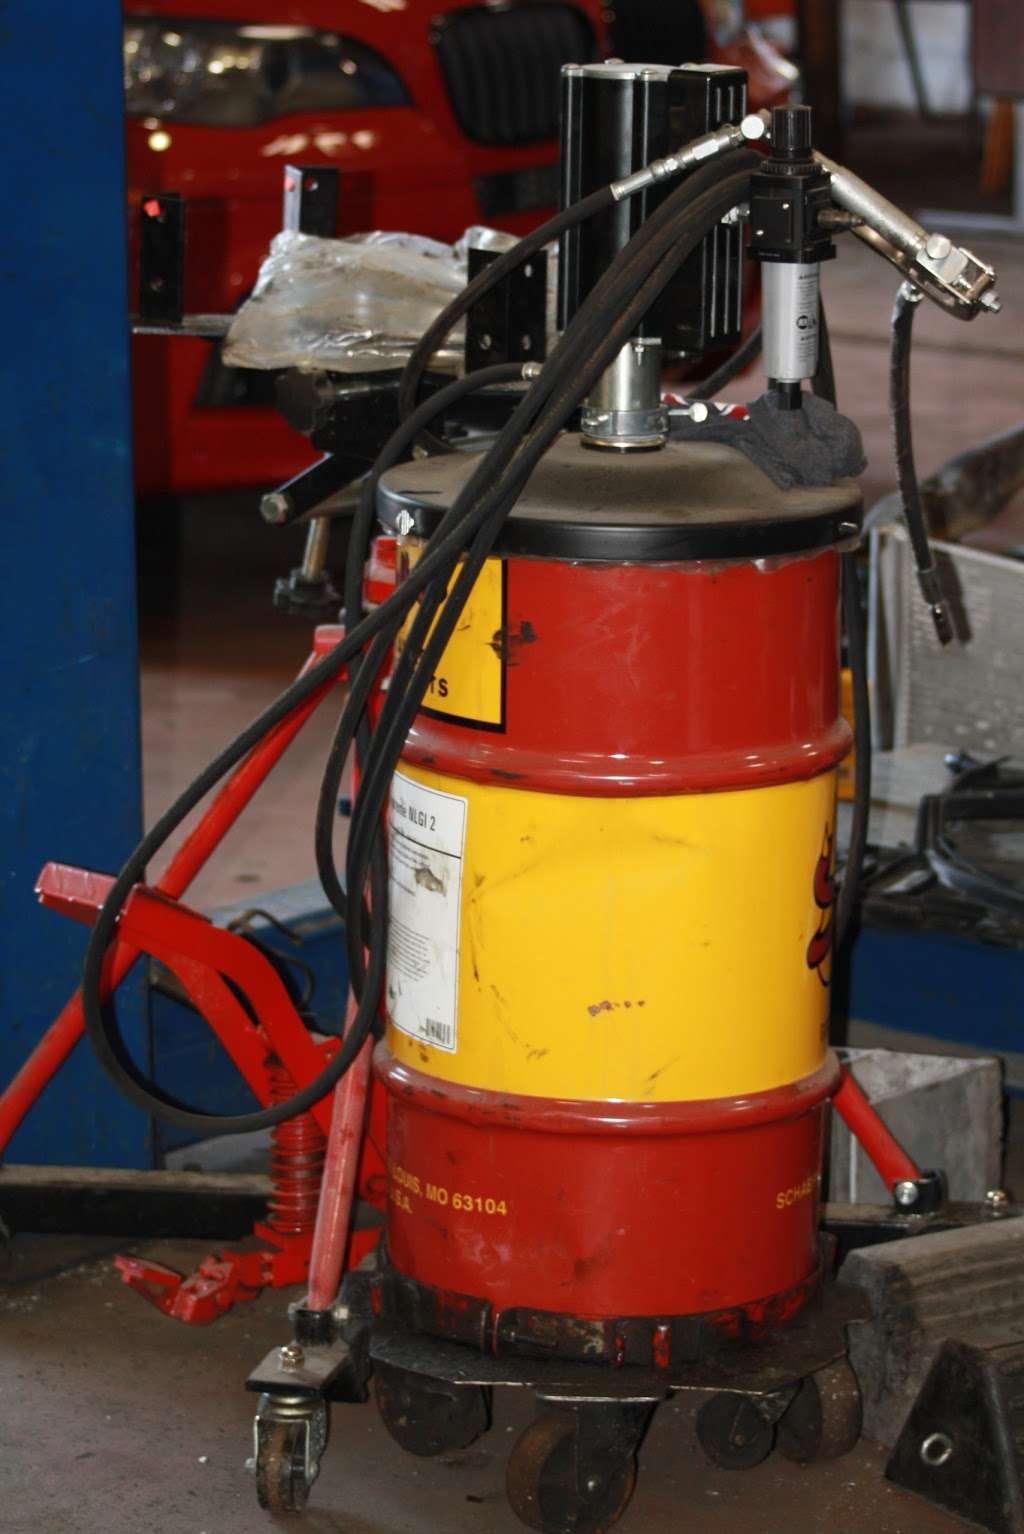 Sharp Express - car repair  | Photo 4 of 10 | Address: 413 Christina Dr, East Dundee, IL 60118, USA | Phone: (773) 616-0013